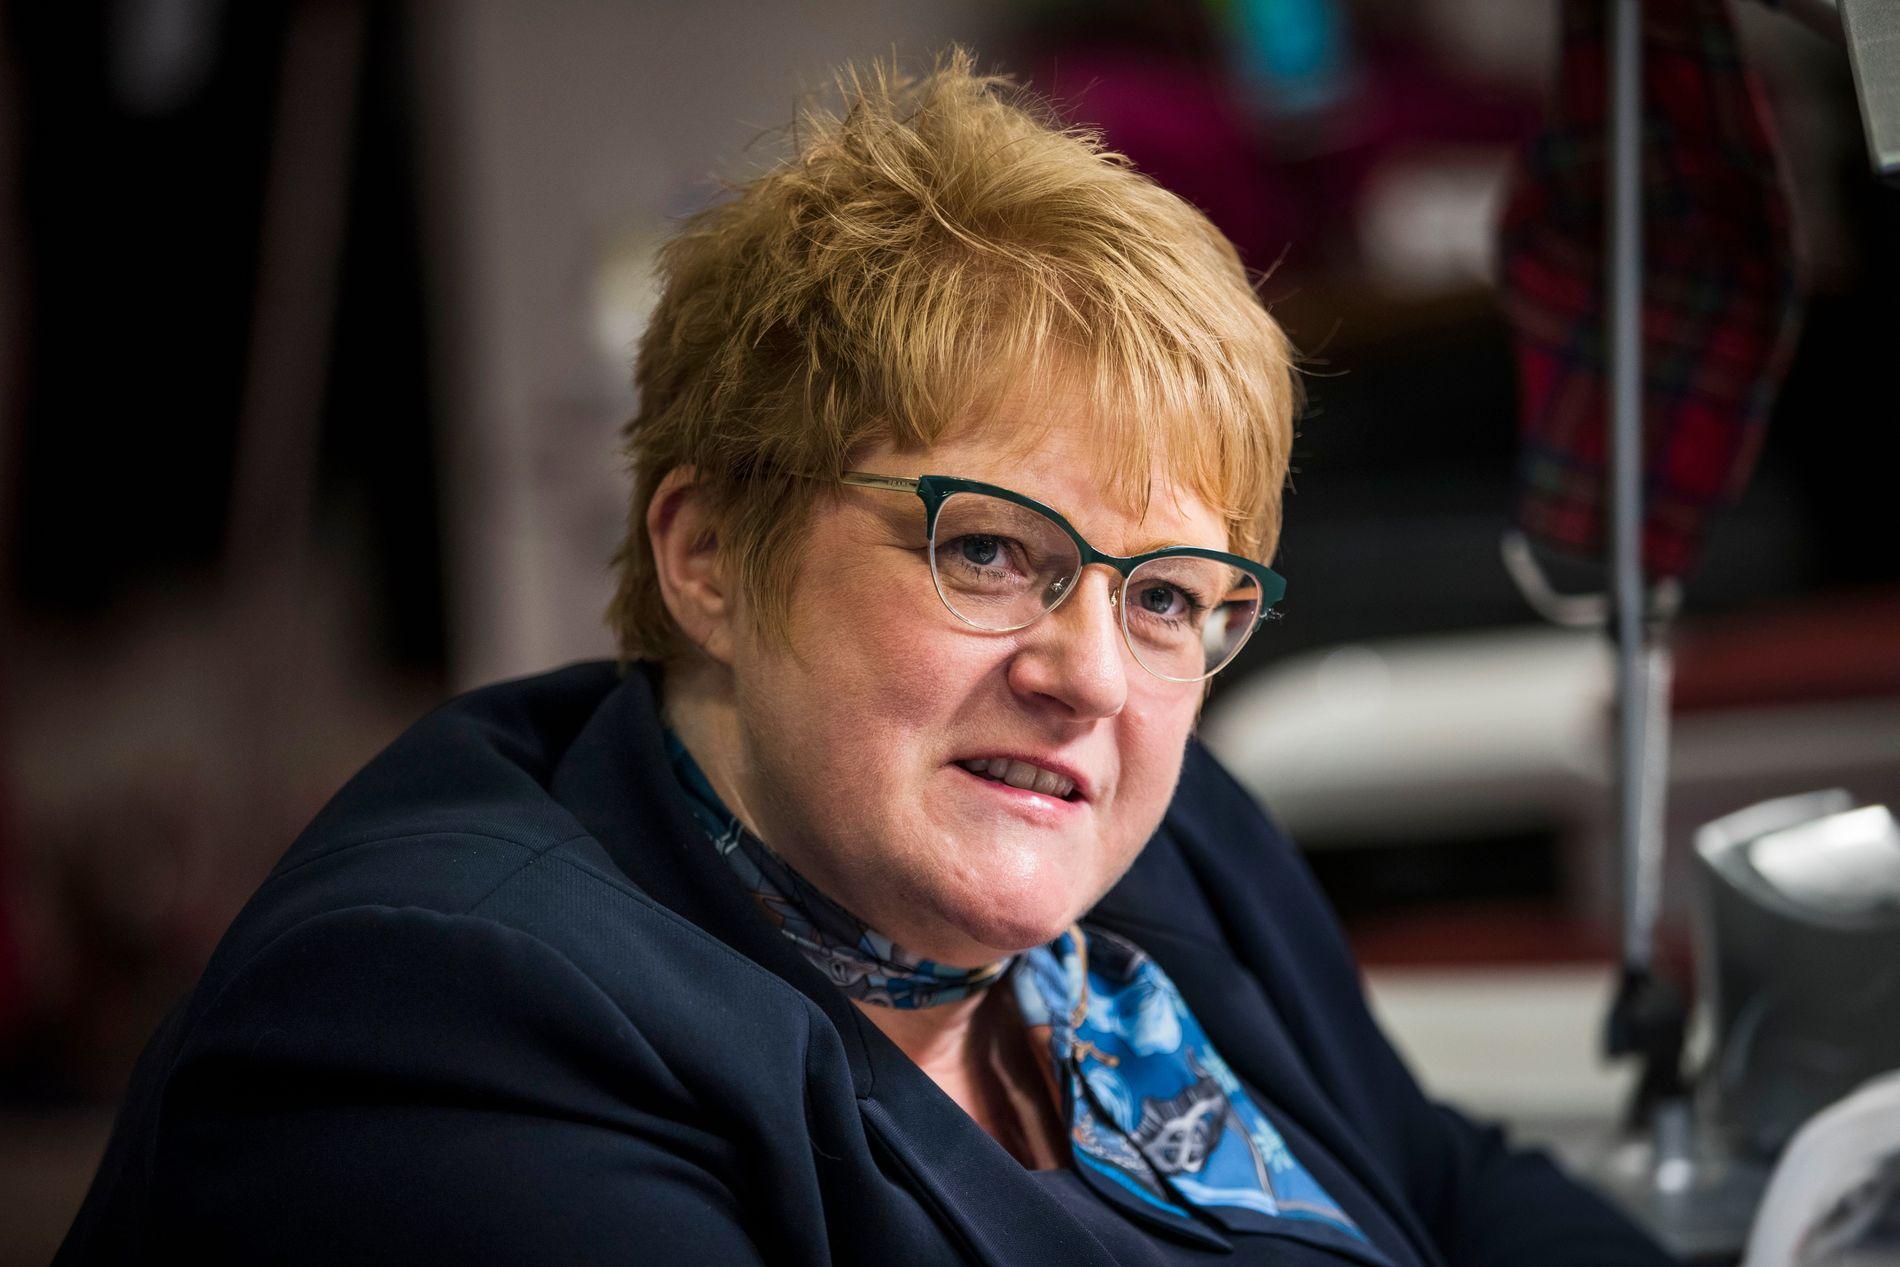 KRITISK: Kulturminister og Venstre-leder Trine Skei Grande, her under et intervju med VG i april.